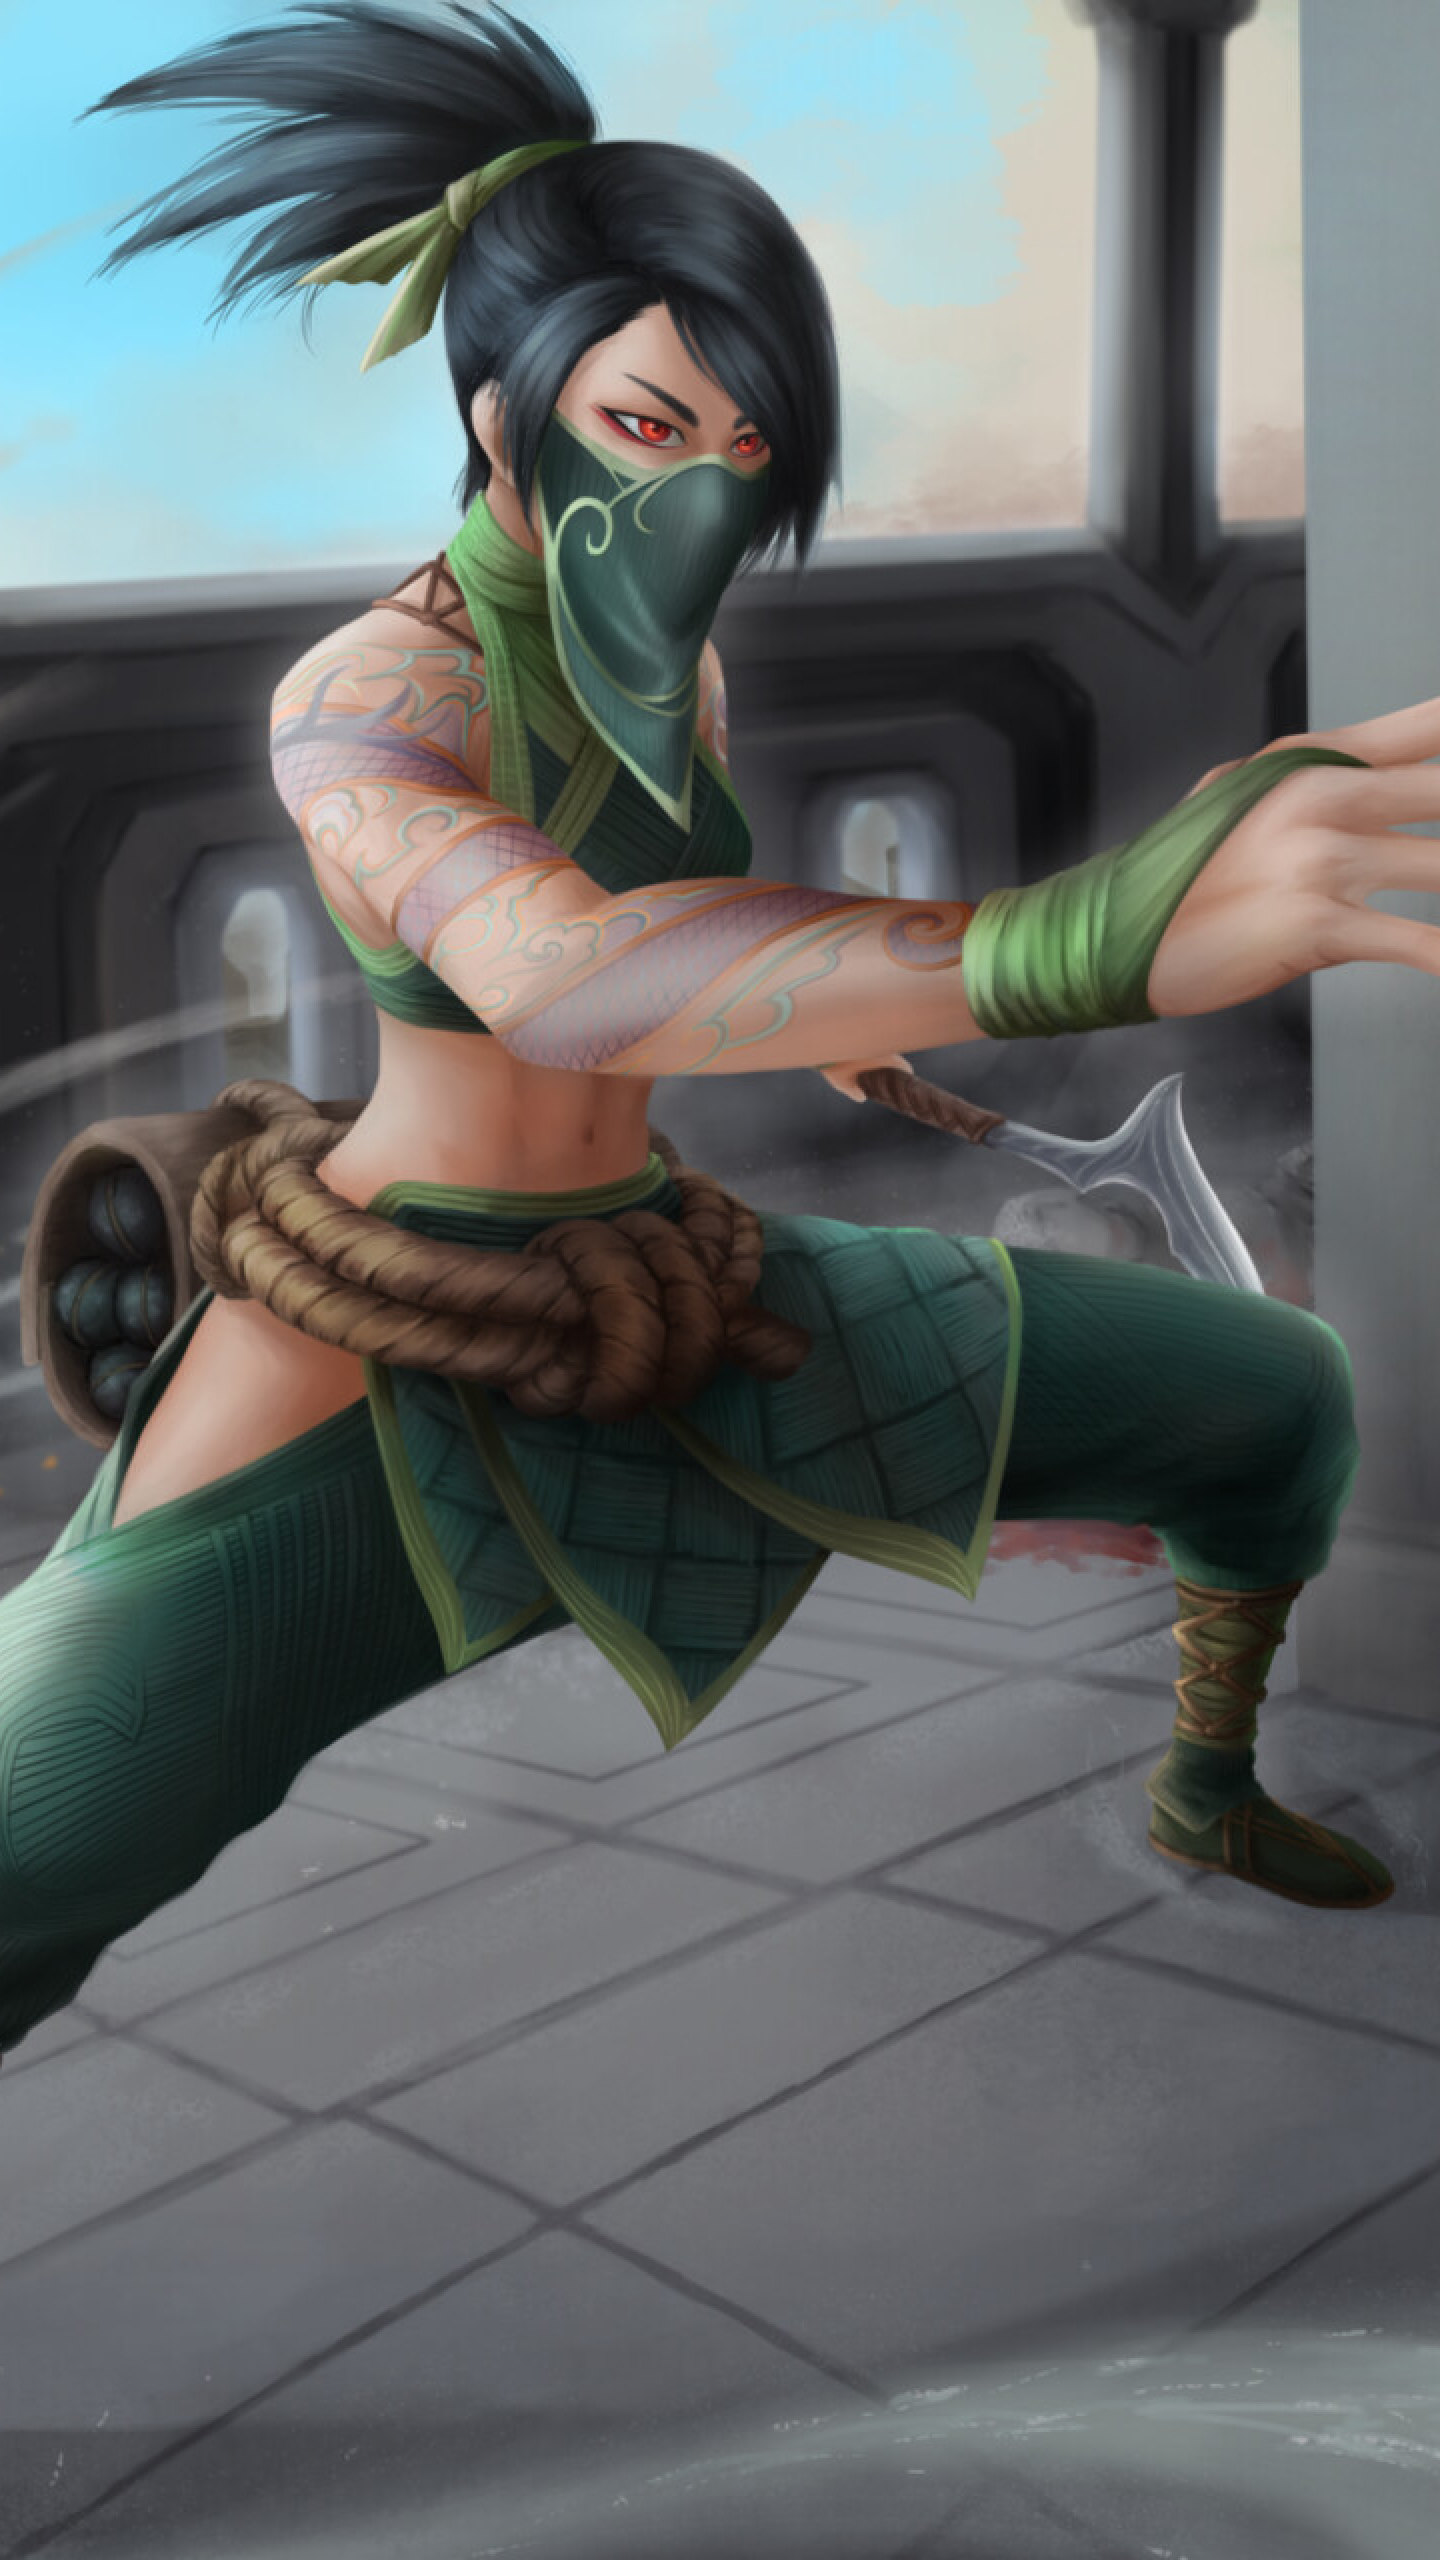 Akali from League Of Legends Wallpaper in 1440x2560 Resolution